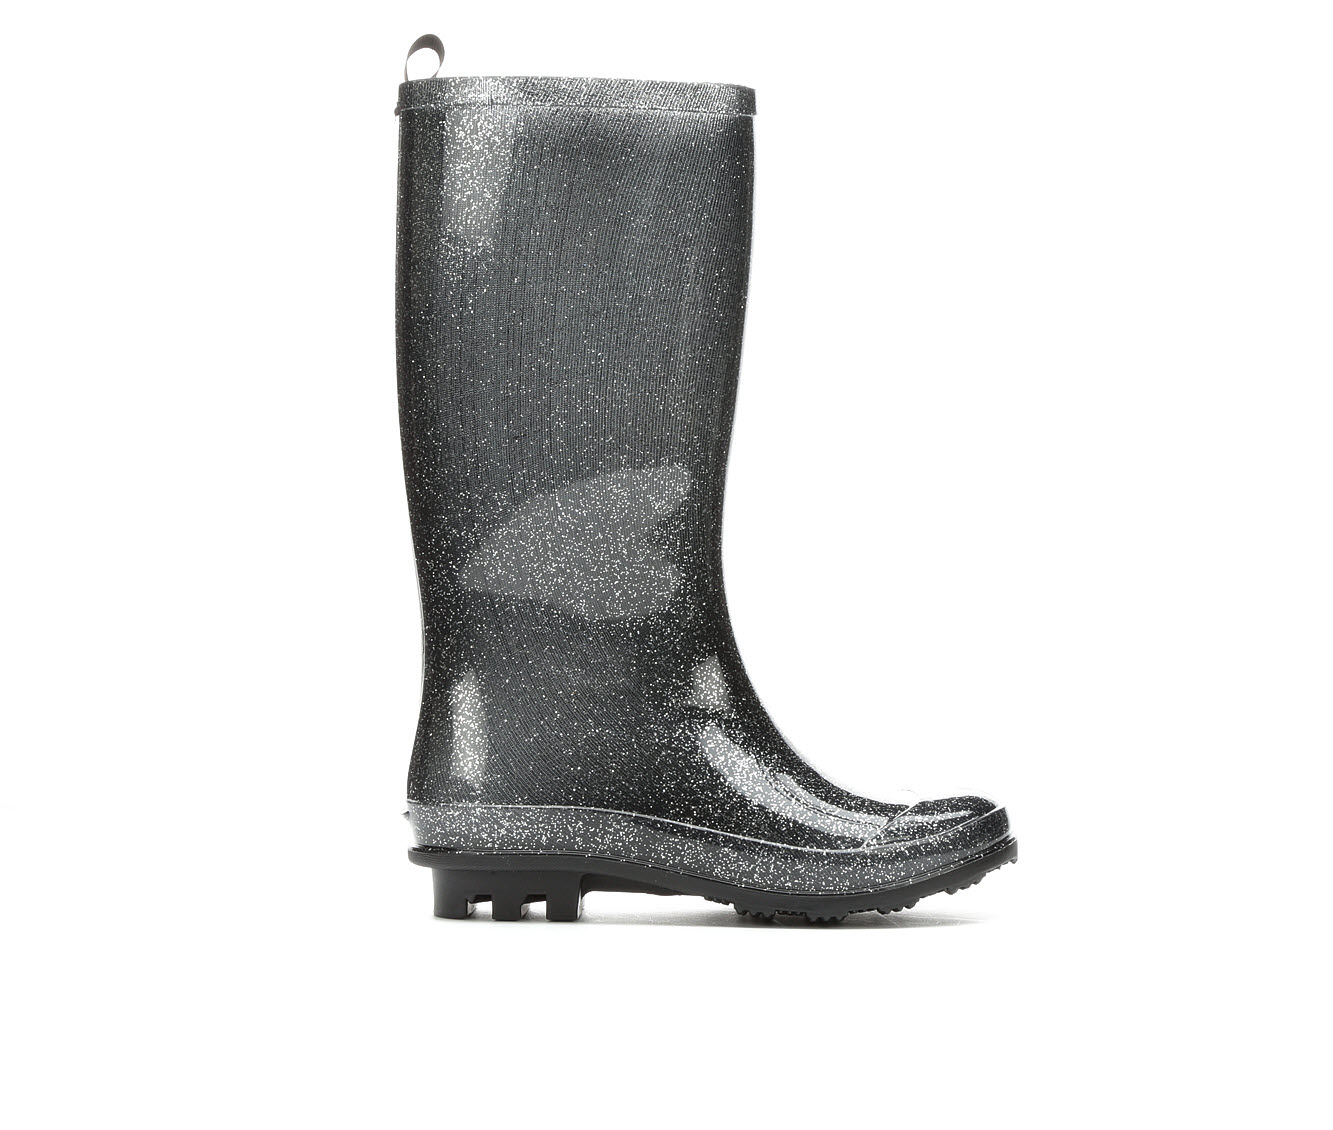 Girls' Capelli New York Rainboot-G 2076 Boots (Black)